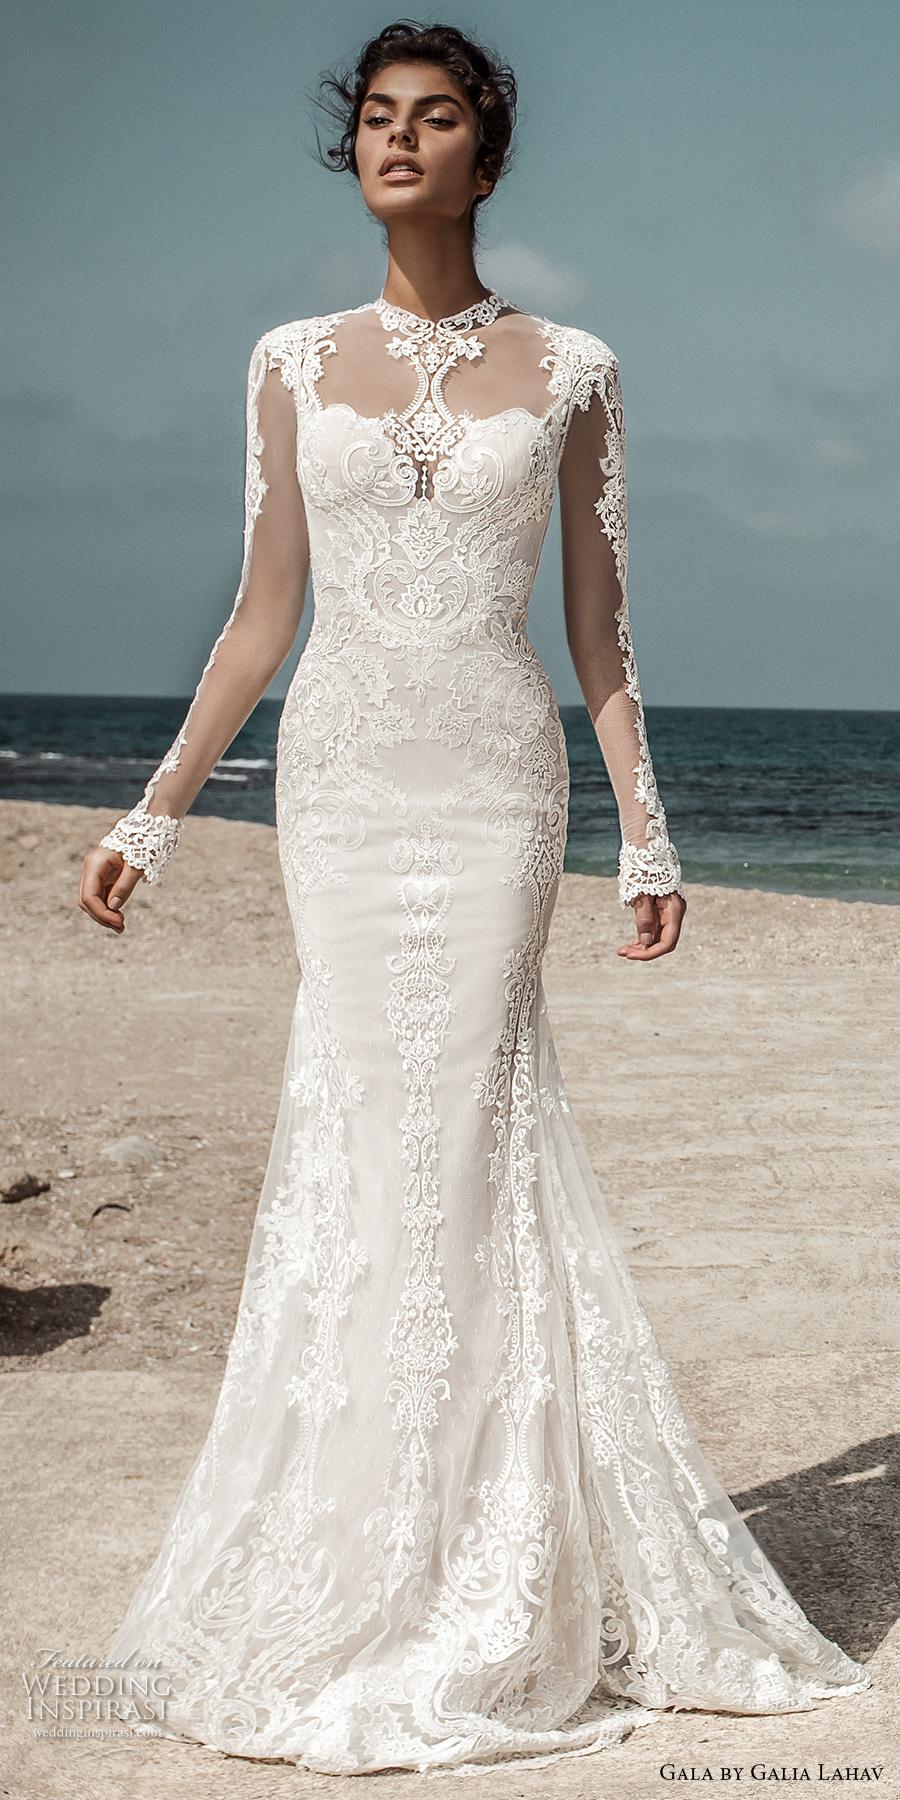 galia lahav gala 2017 bridal long sleeves illusion high jewel sweetheart neckline heavily embellished bodic elegant lace fit and flare wedding dress open low back sweep train (801) mv